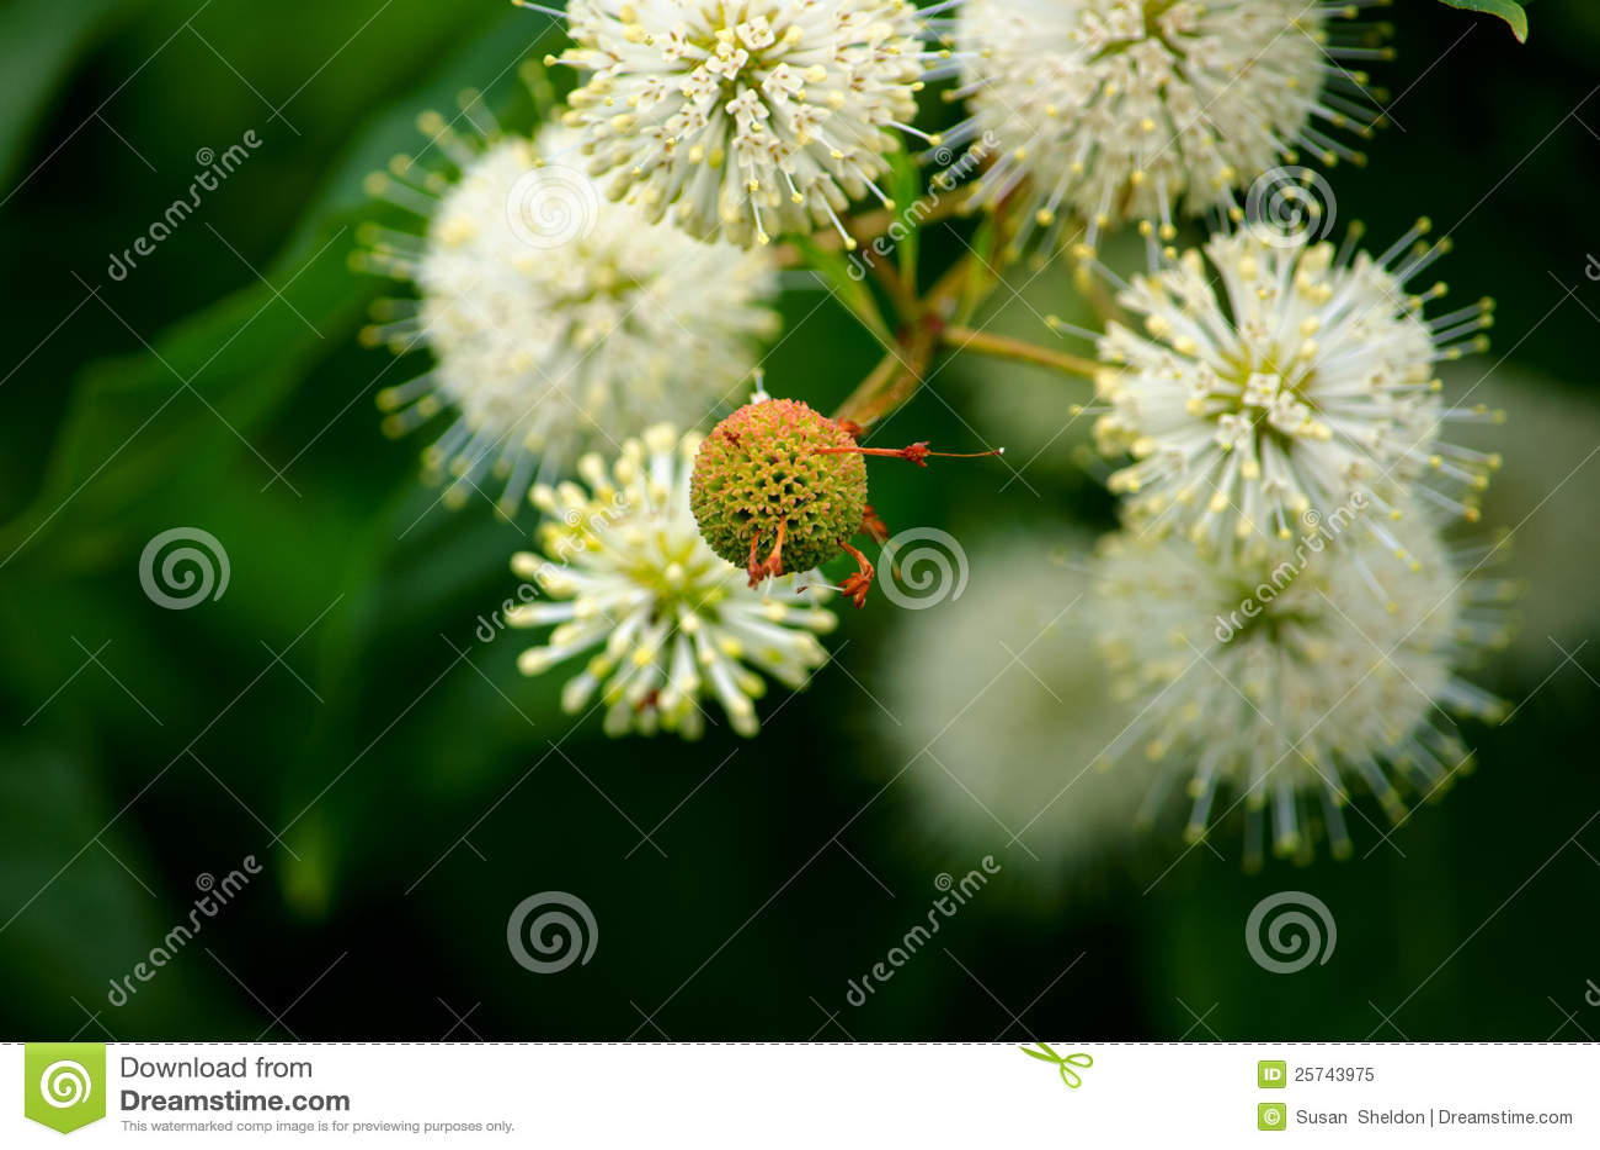 White button bush